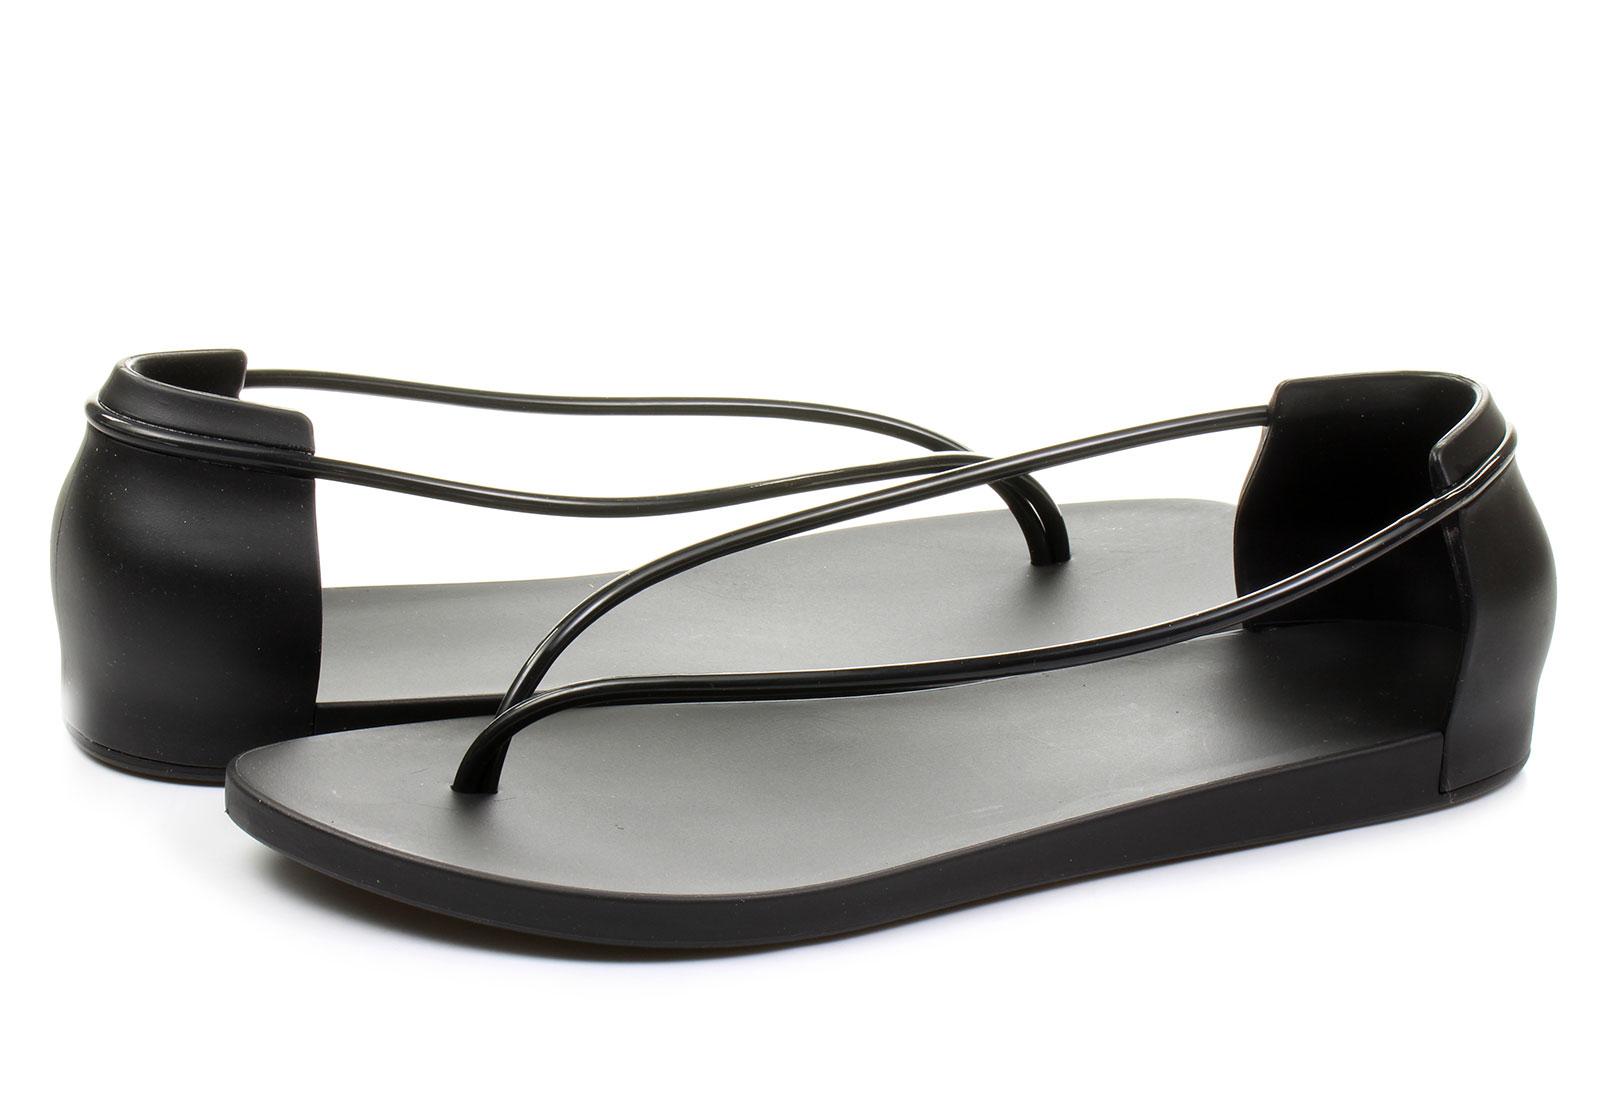 0d0fe71395d2 Ipanema Sandals - Philippe Starck Elegant - 81602-20880 - Online ...